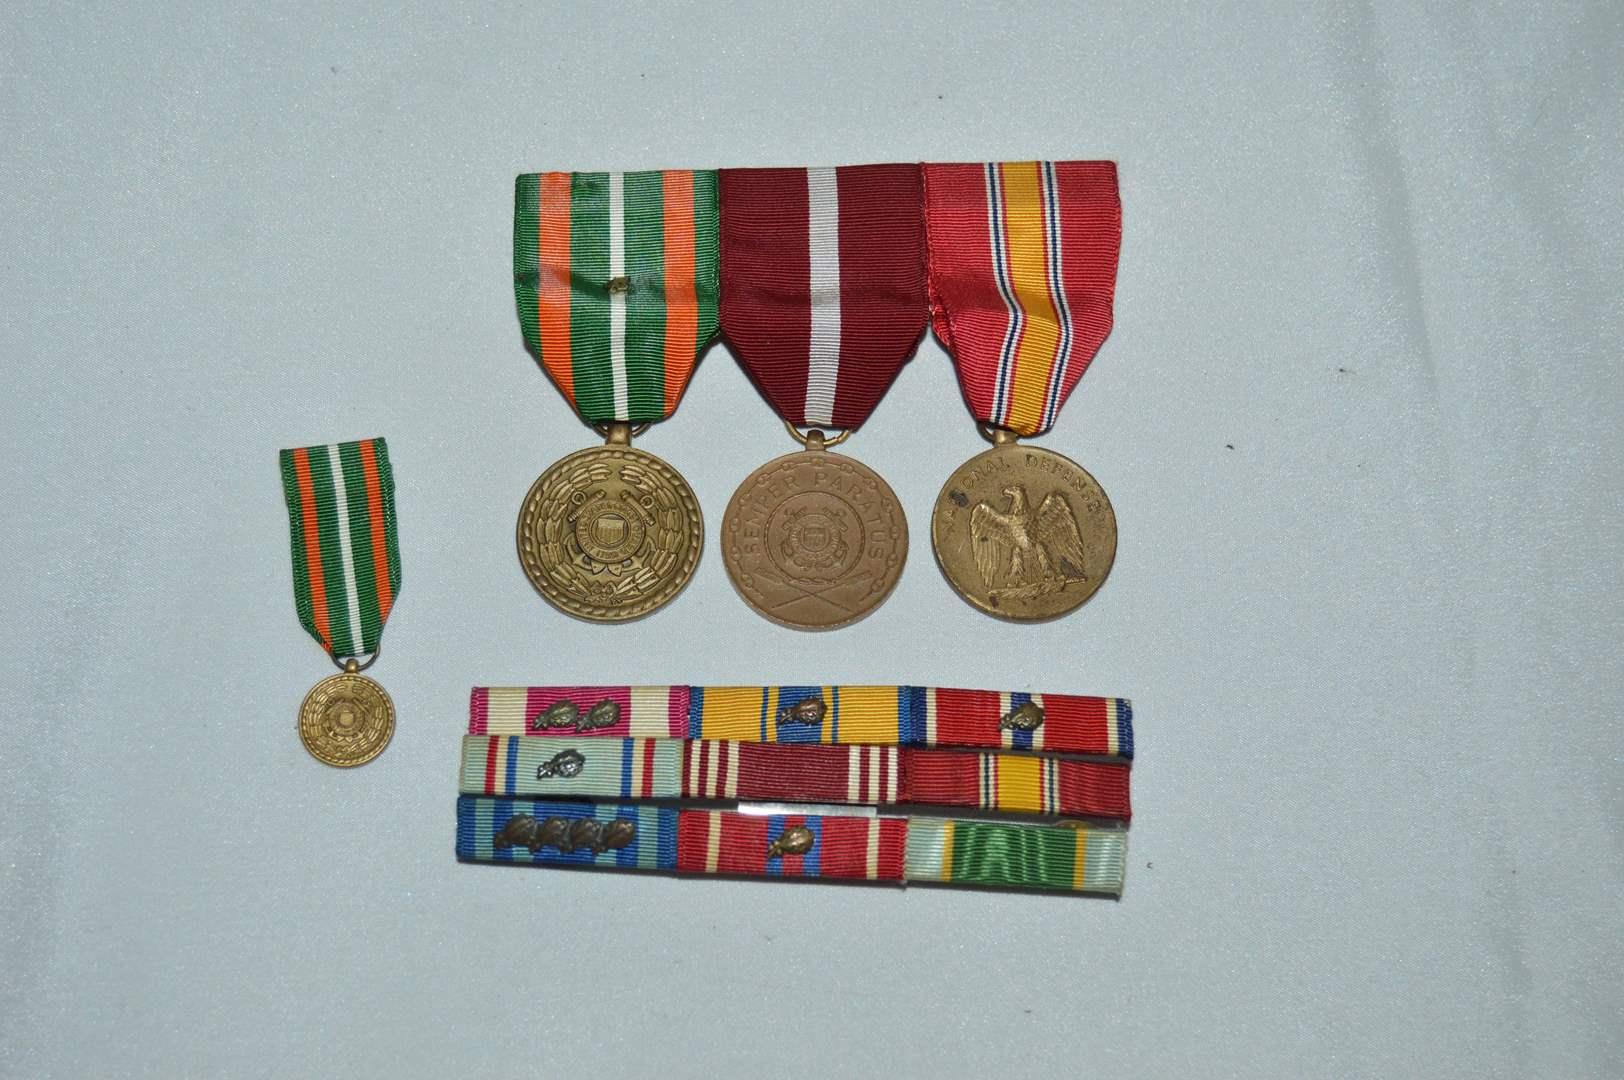 Lot # 93 Military medals and memorabilia (main image)